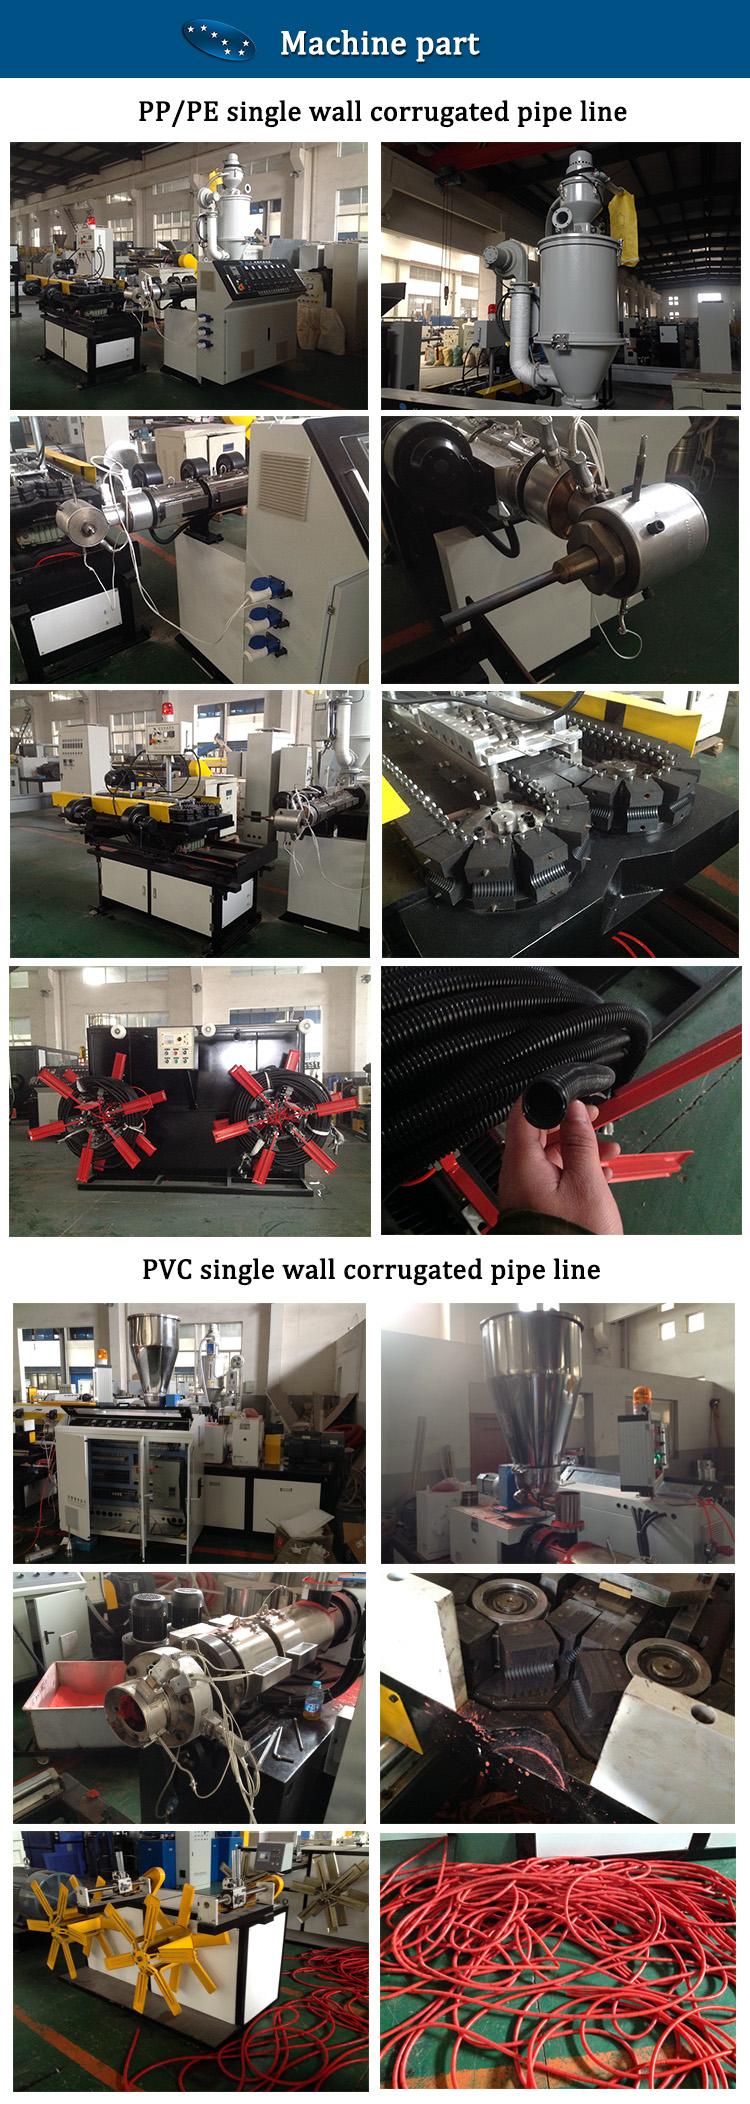 PP PE PVC单壁波纹管产线机器组成展示